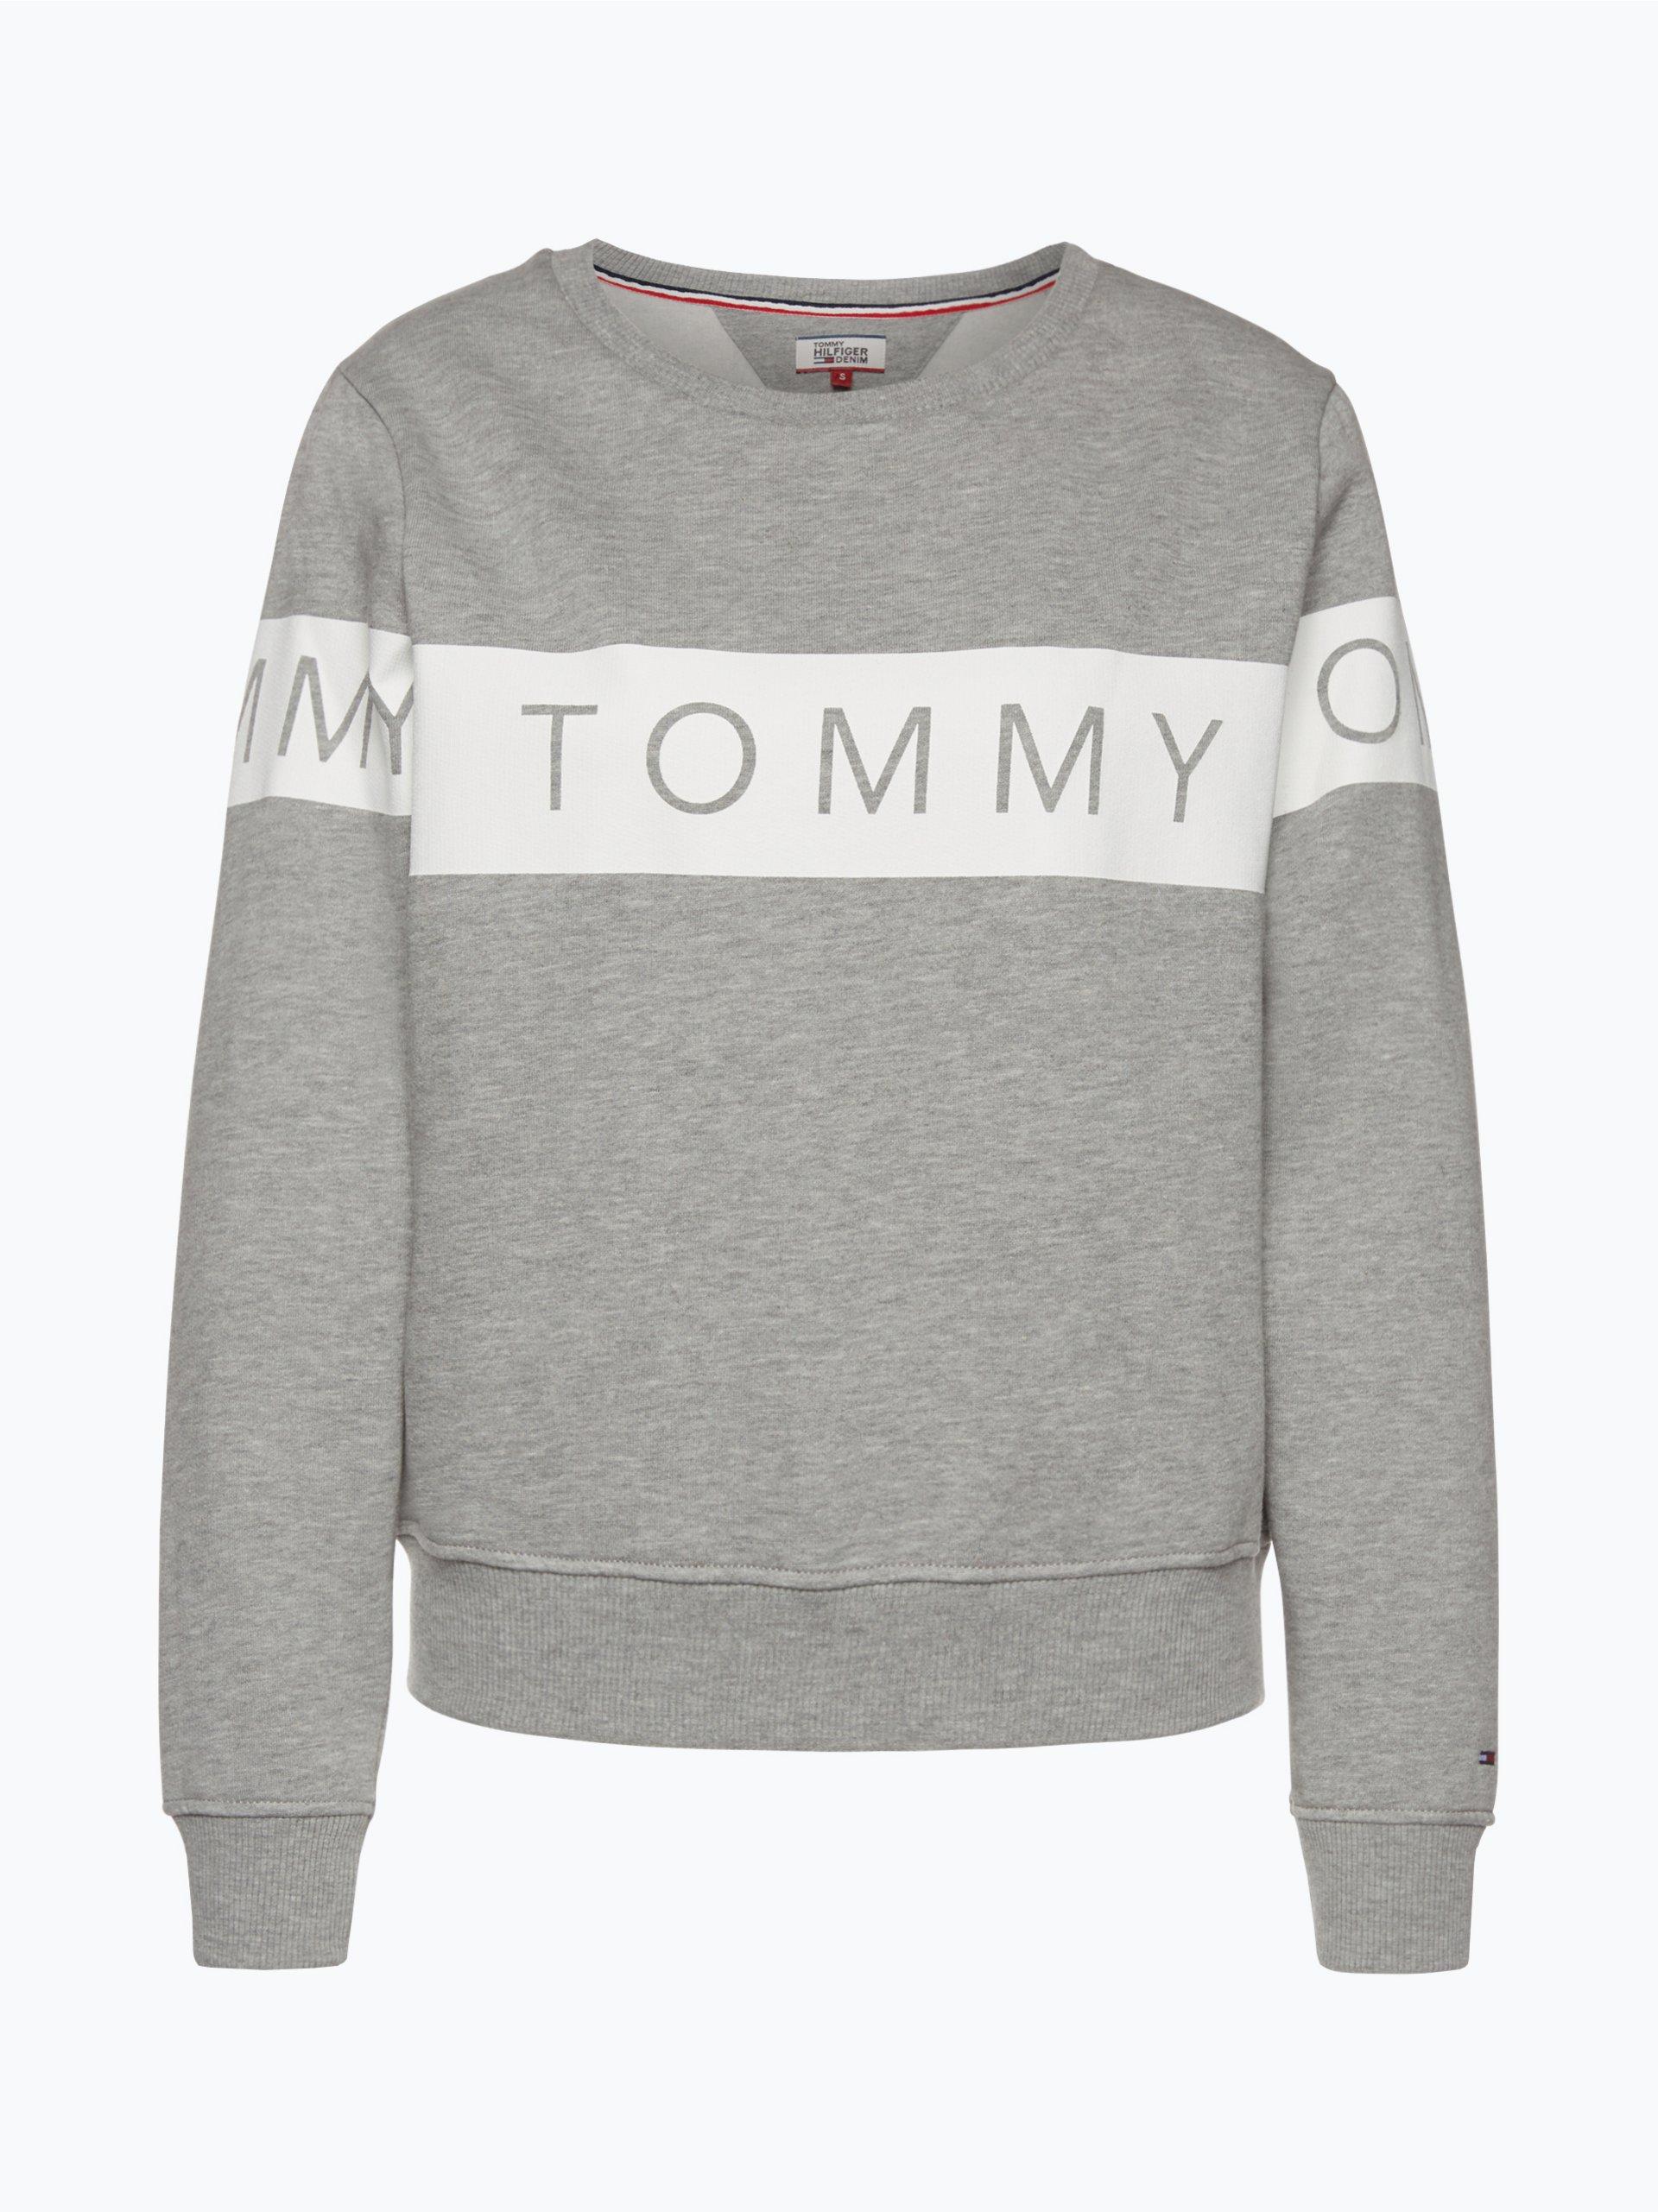 tommy jeans damen sweatshirt grau uni online kaufen peek. Black Bedroom Furniture Sets. Home Design Ideas